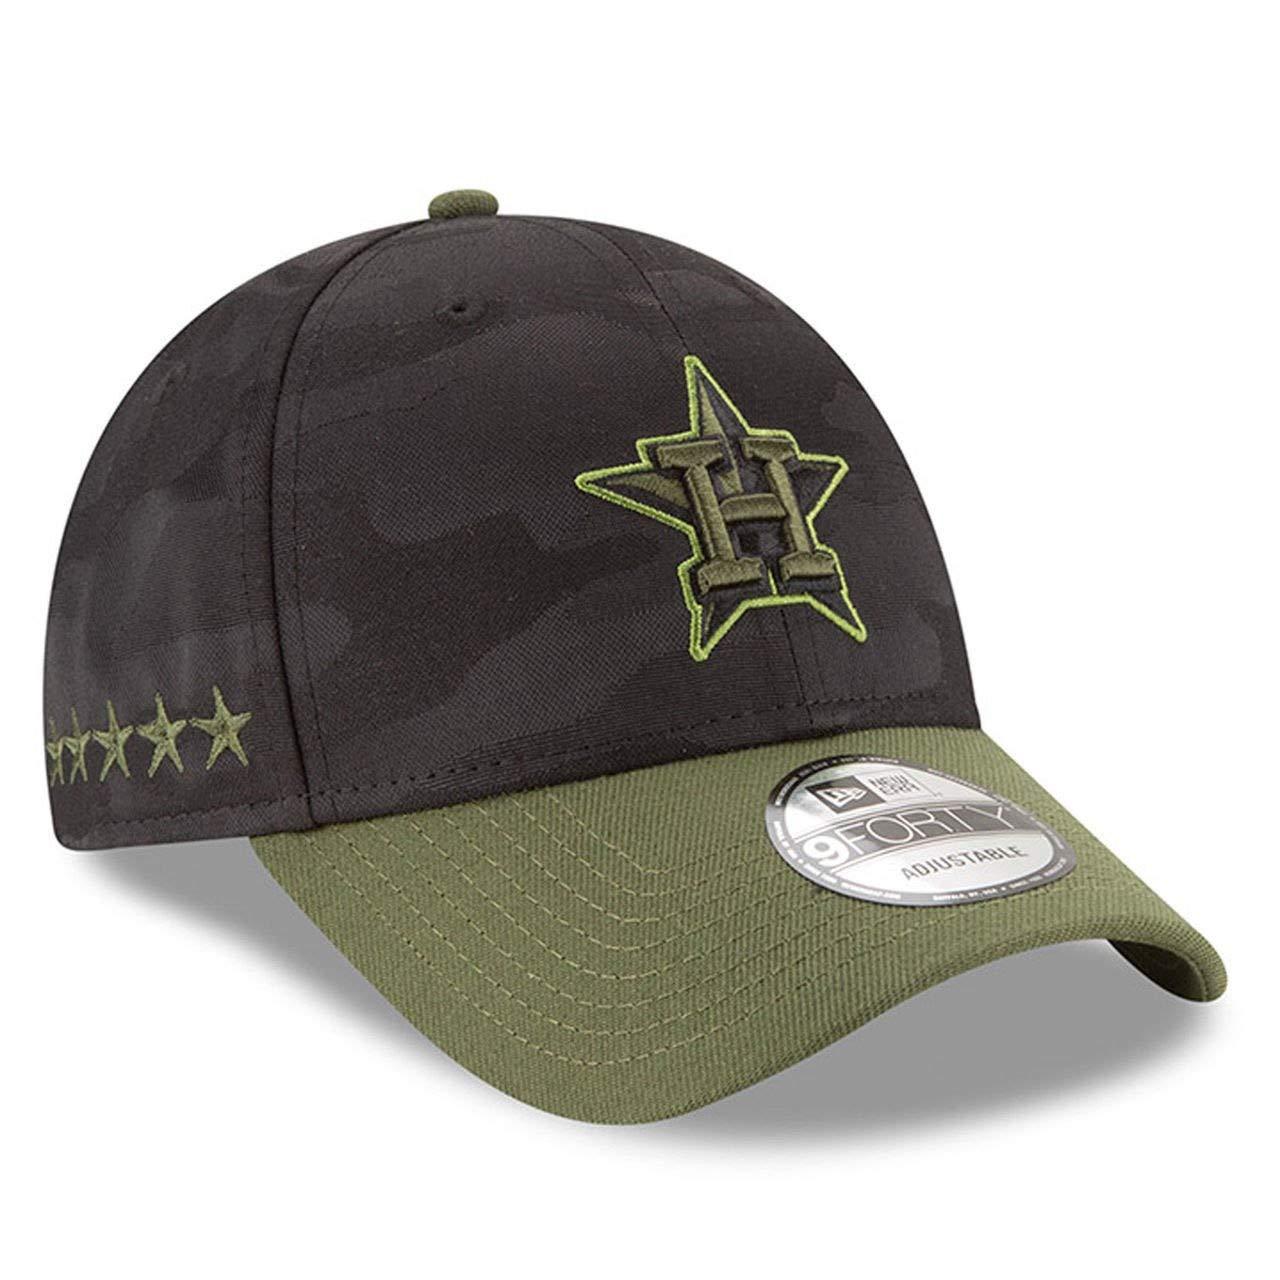 New Era Houston Astros 2018 Memorial Day 9FORTY Adjustable Hat